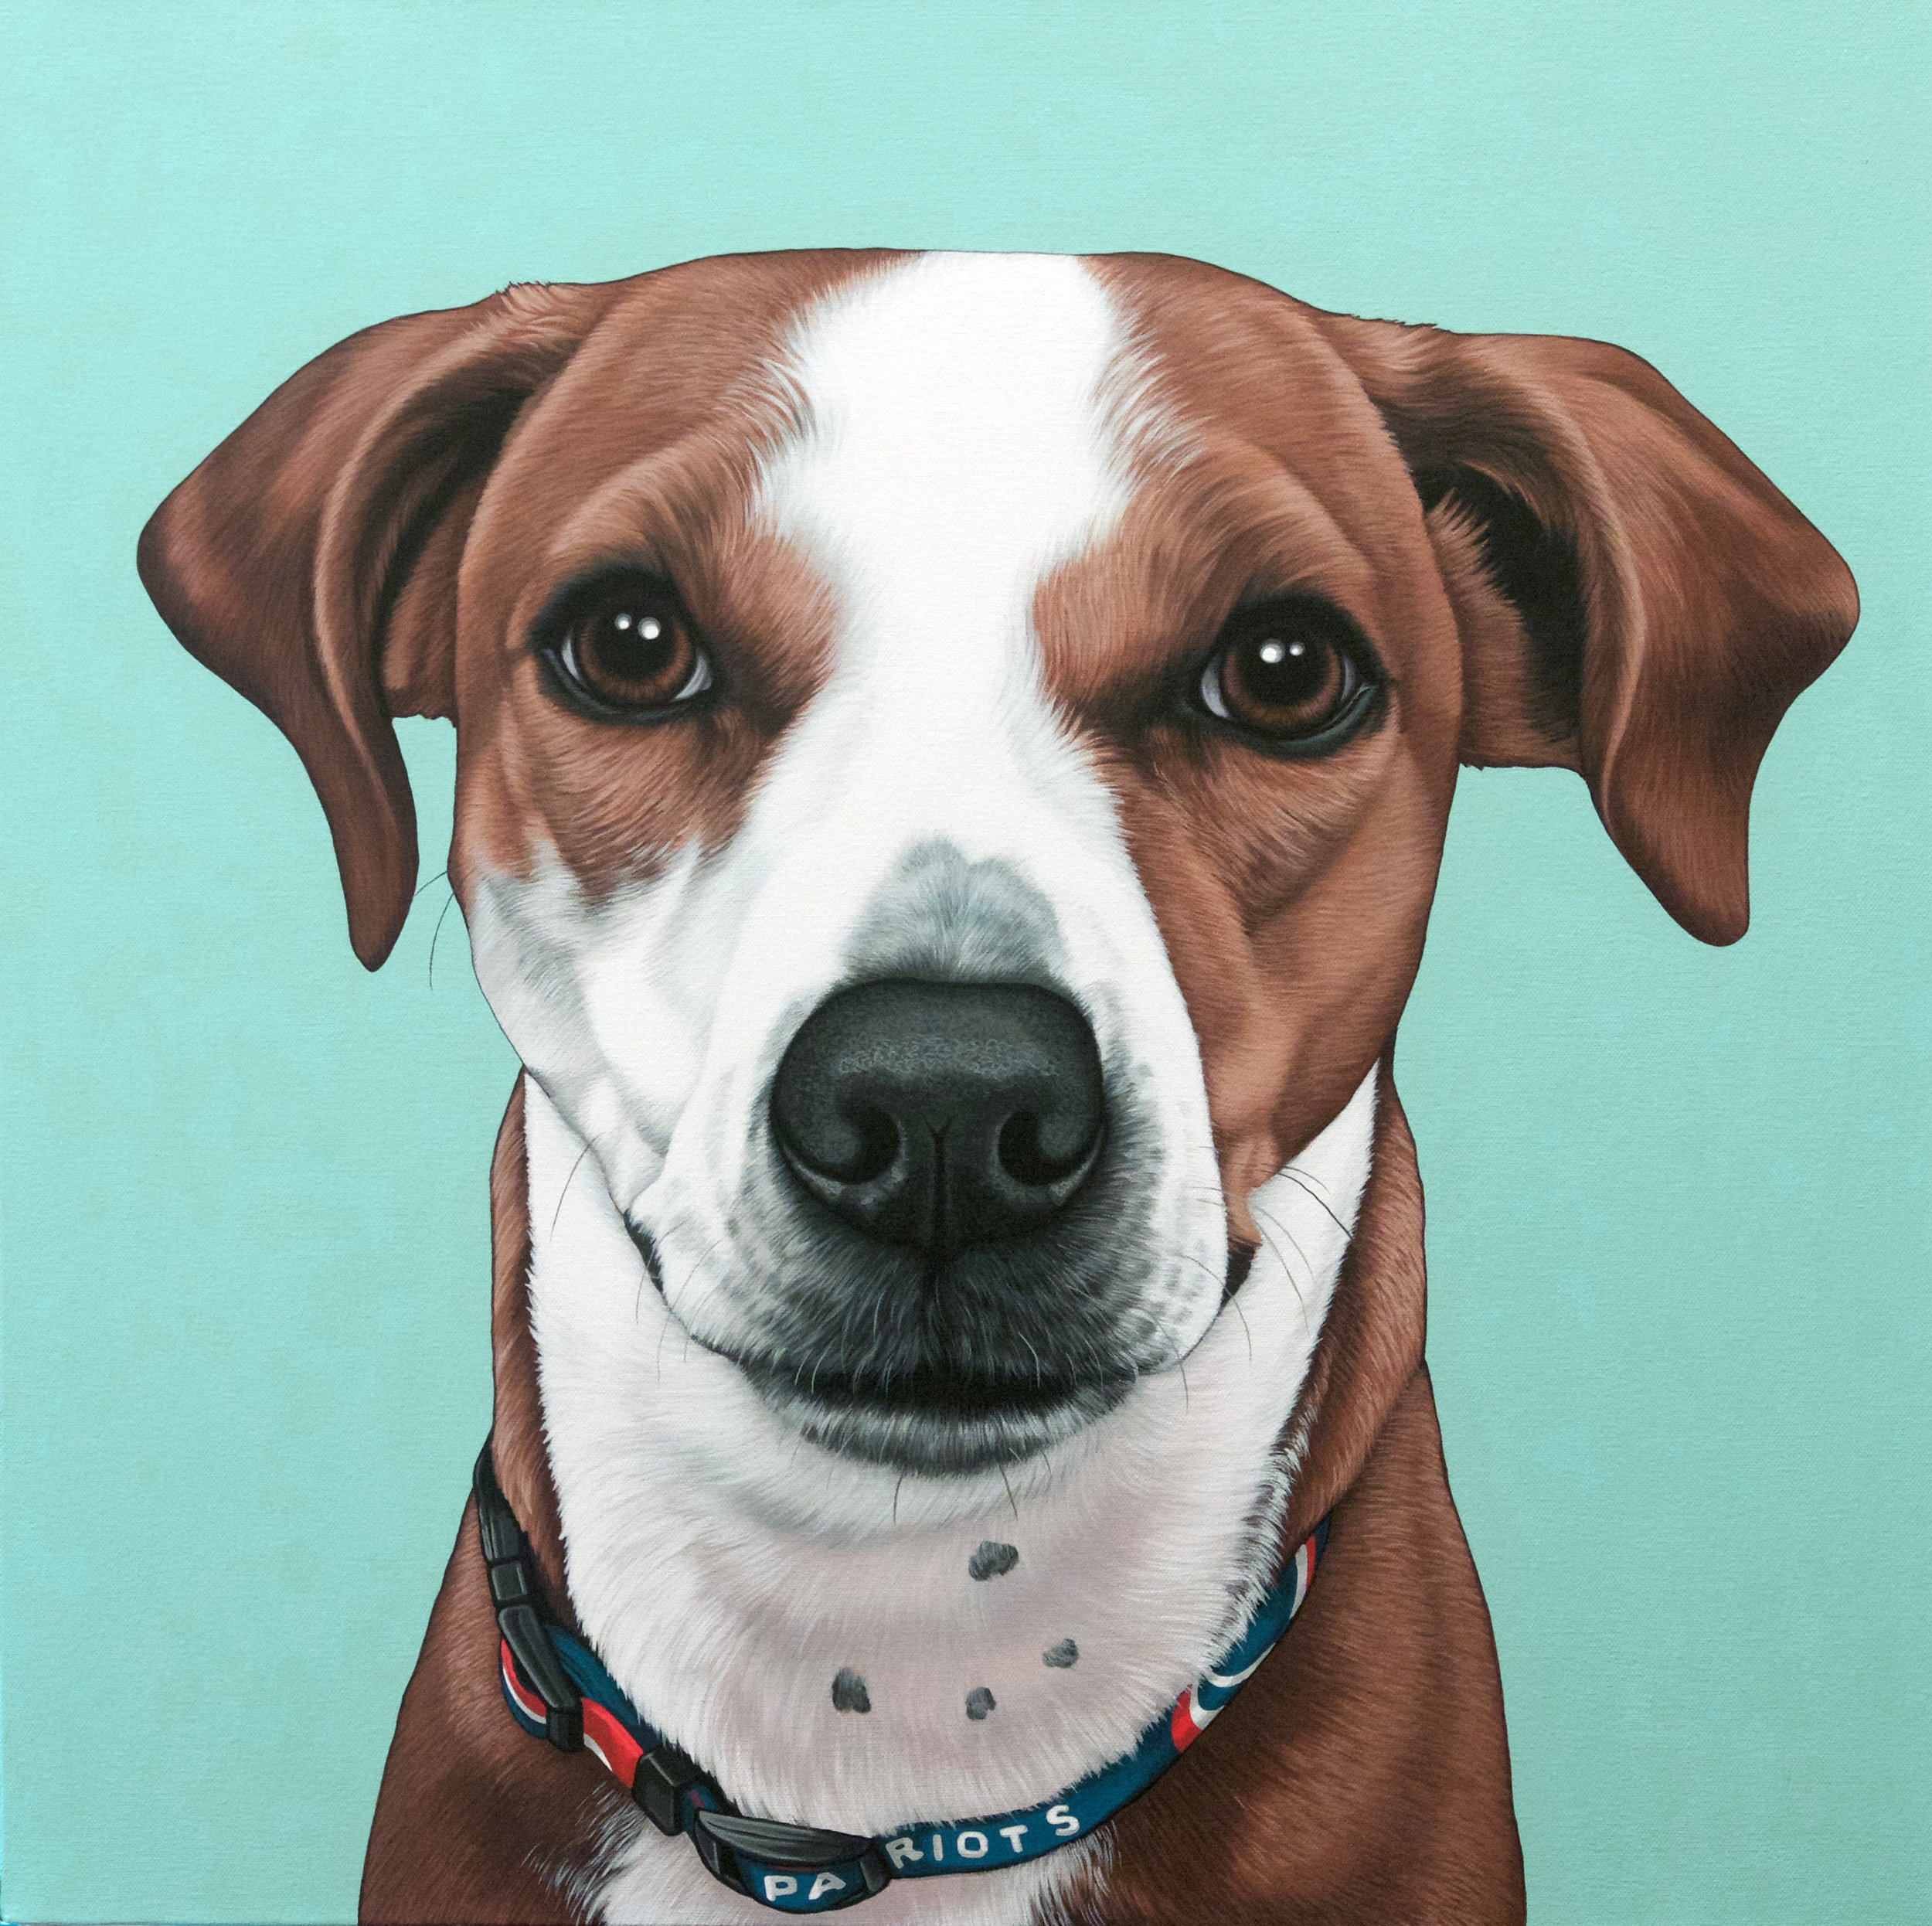 """Brady"", latex enamel on canvas, 24"" x 24"", 2016"